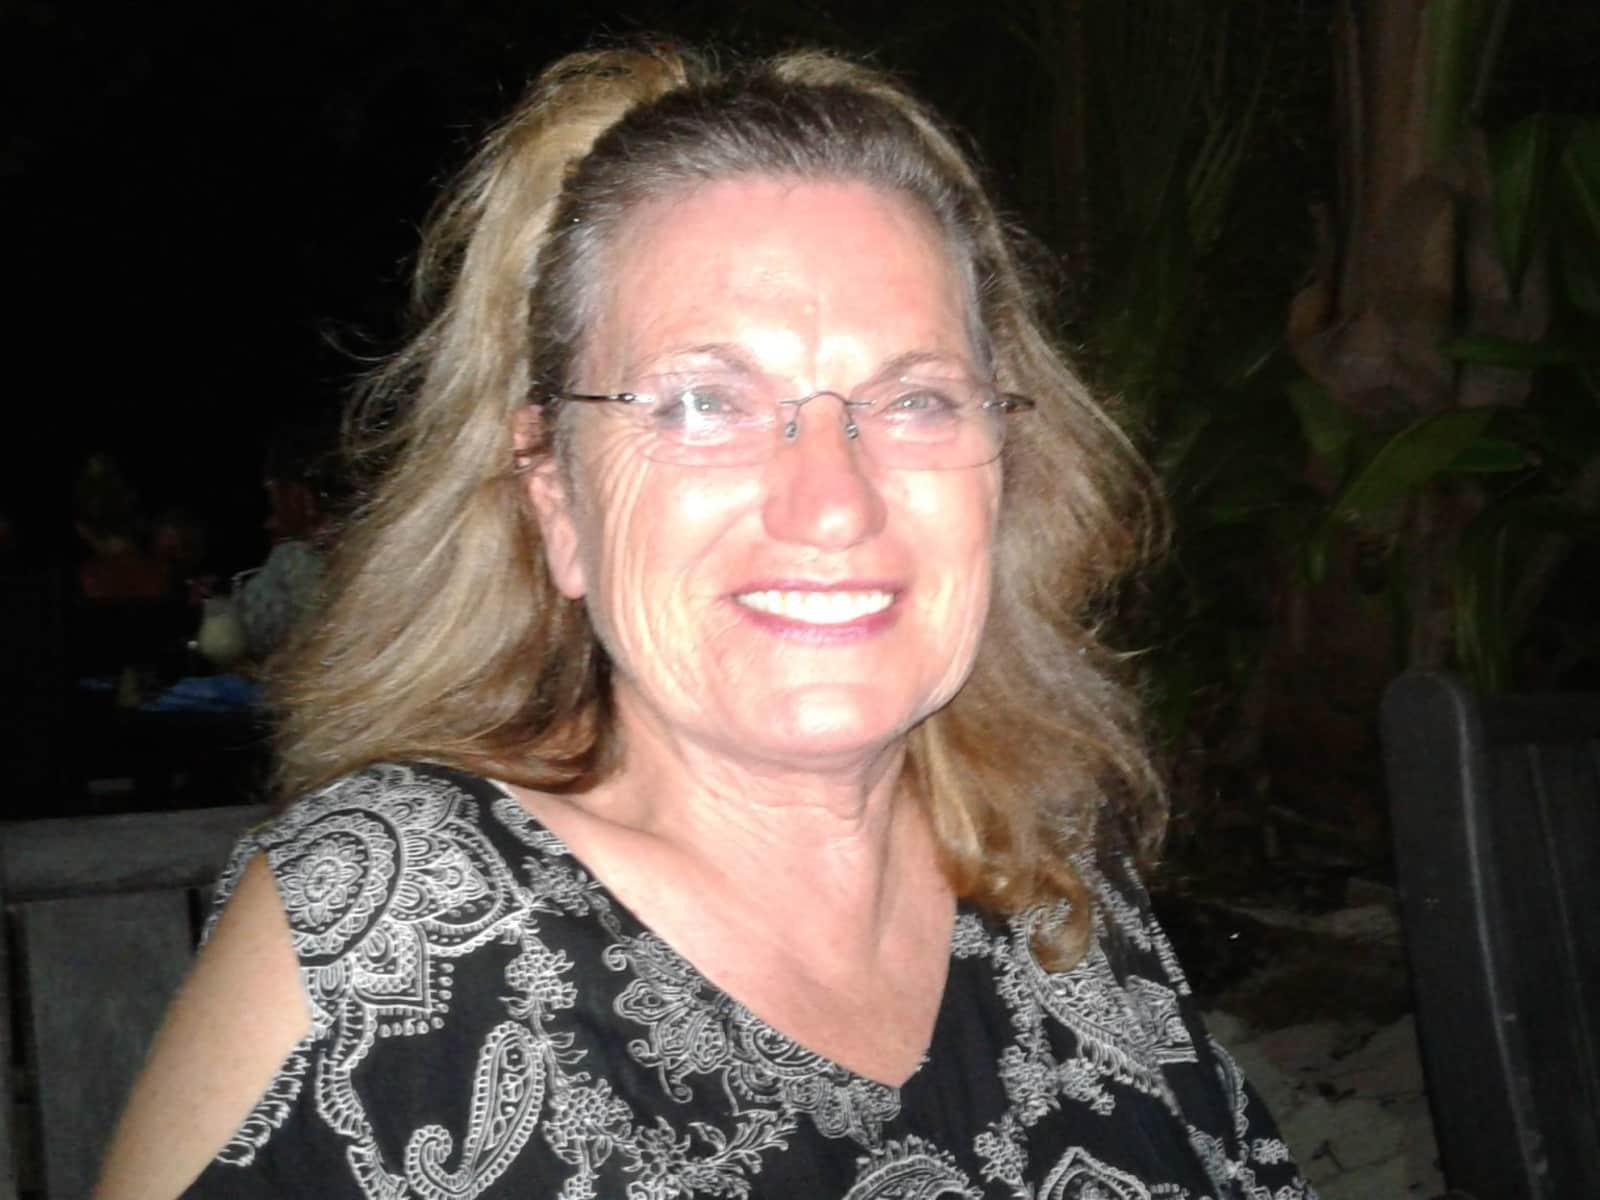 Janet from Te Aroha, New Zealand